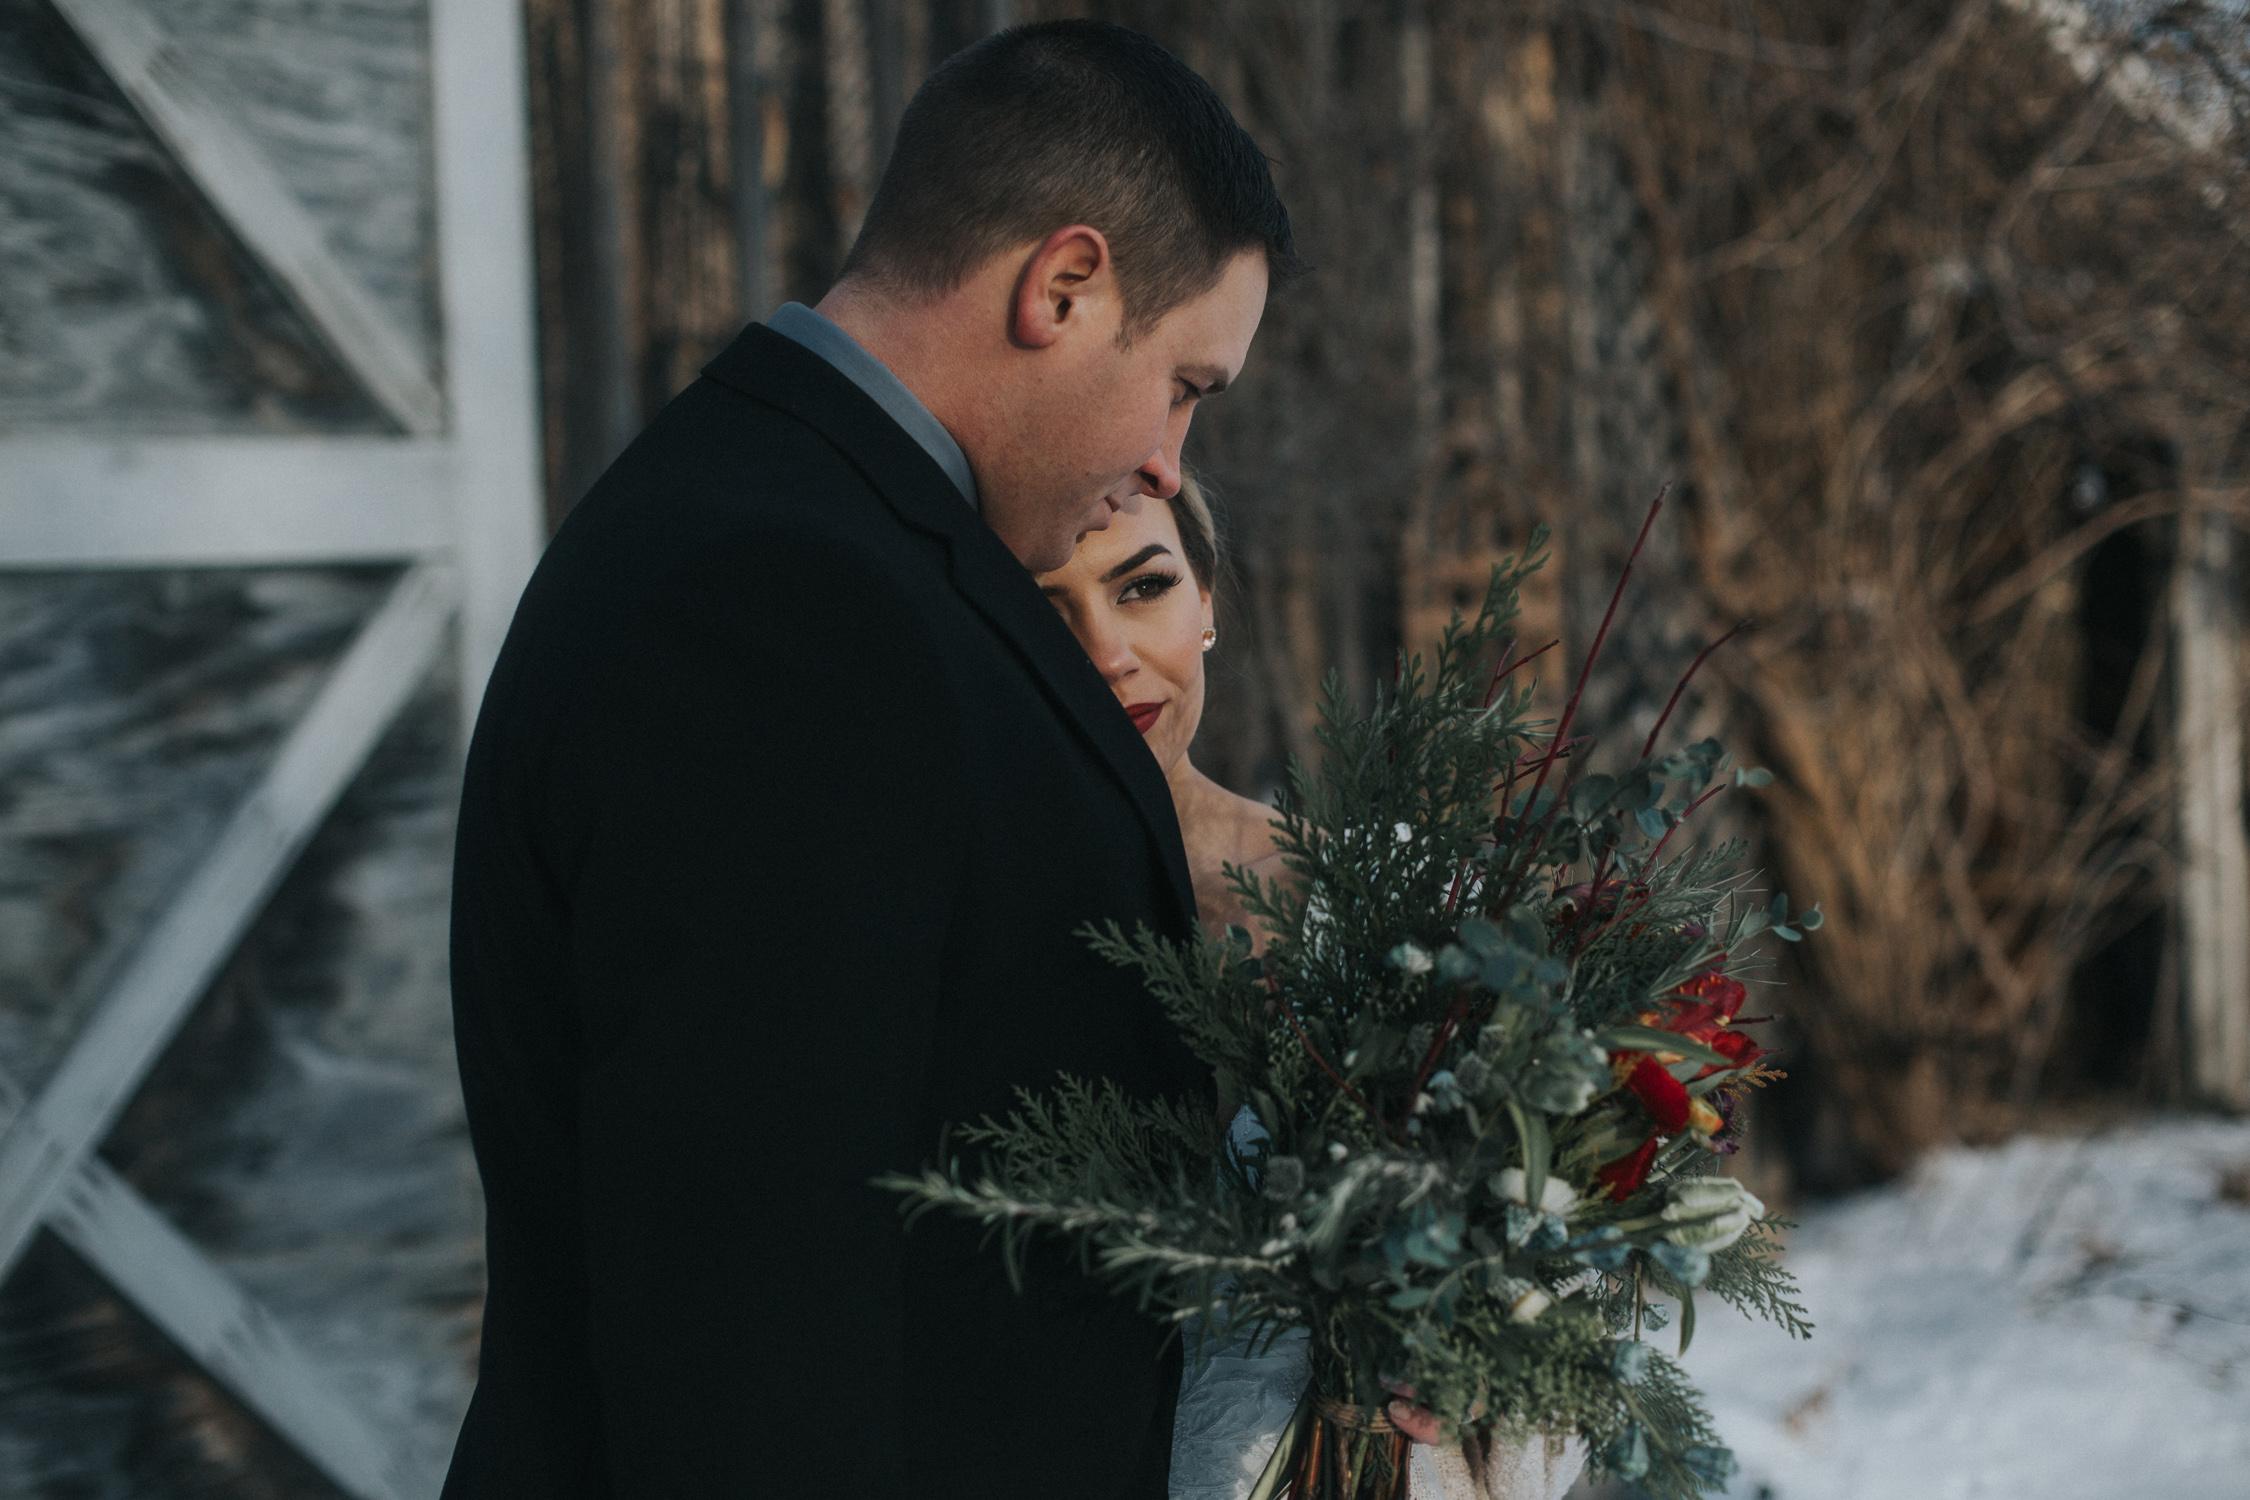 mnd_farm_winter_wedding_009.jpg